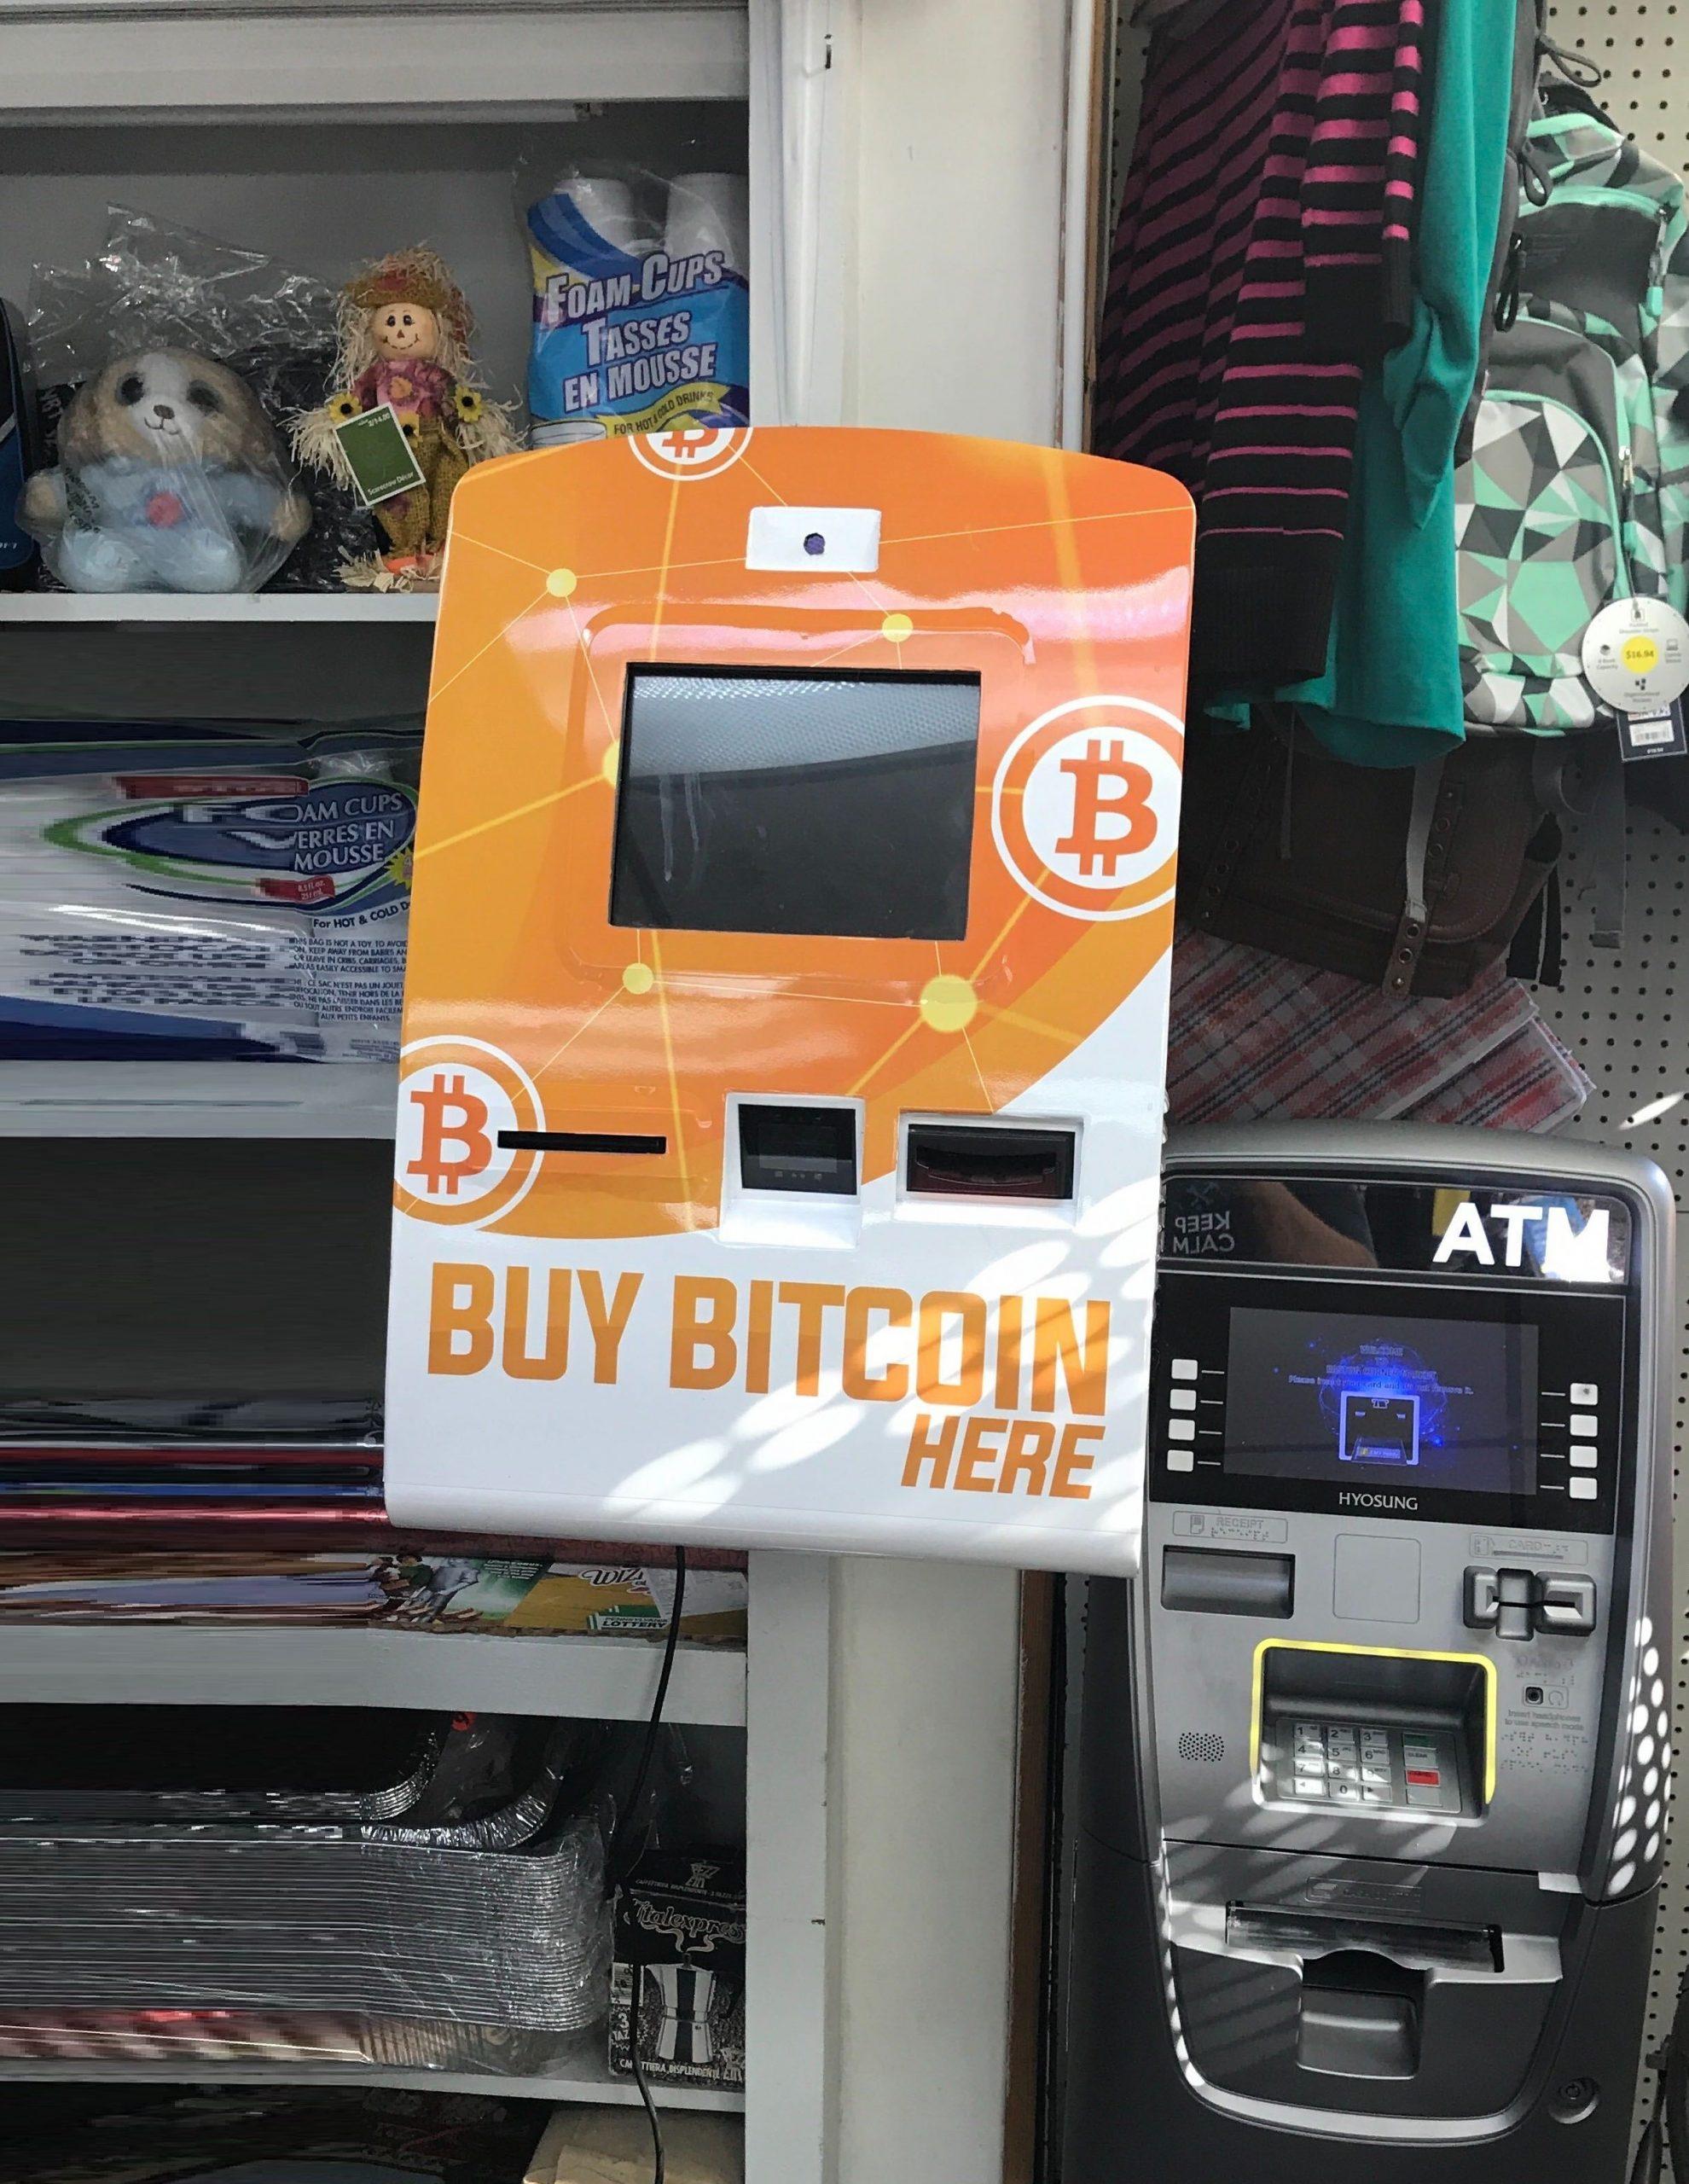 Bitcoin ATM Easton, 359 Northampton St, Easton by Hippo Bitcoin ATM - Hippo Kiosks for buying Bitcoin near you